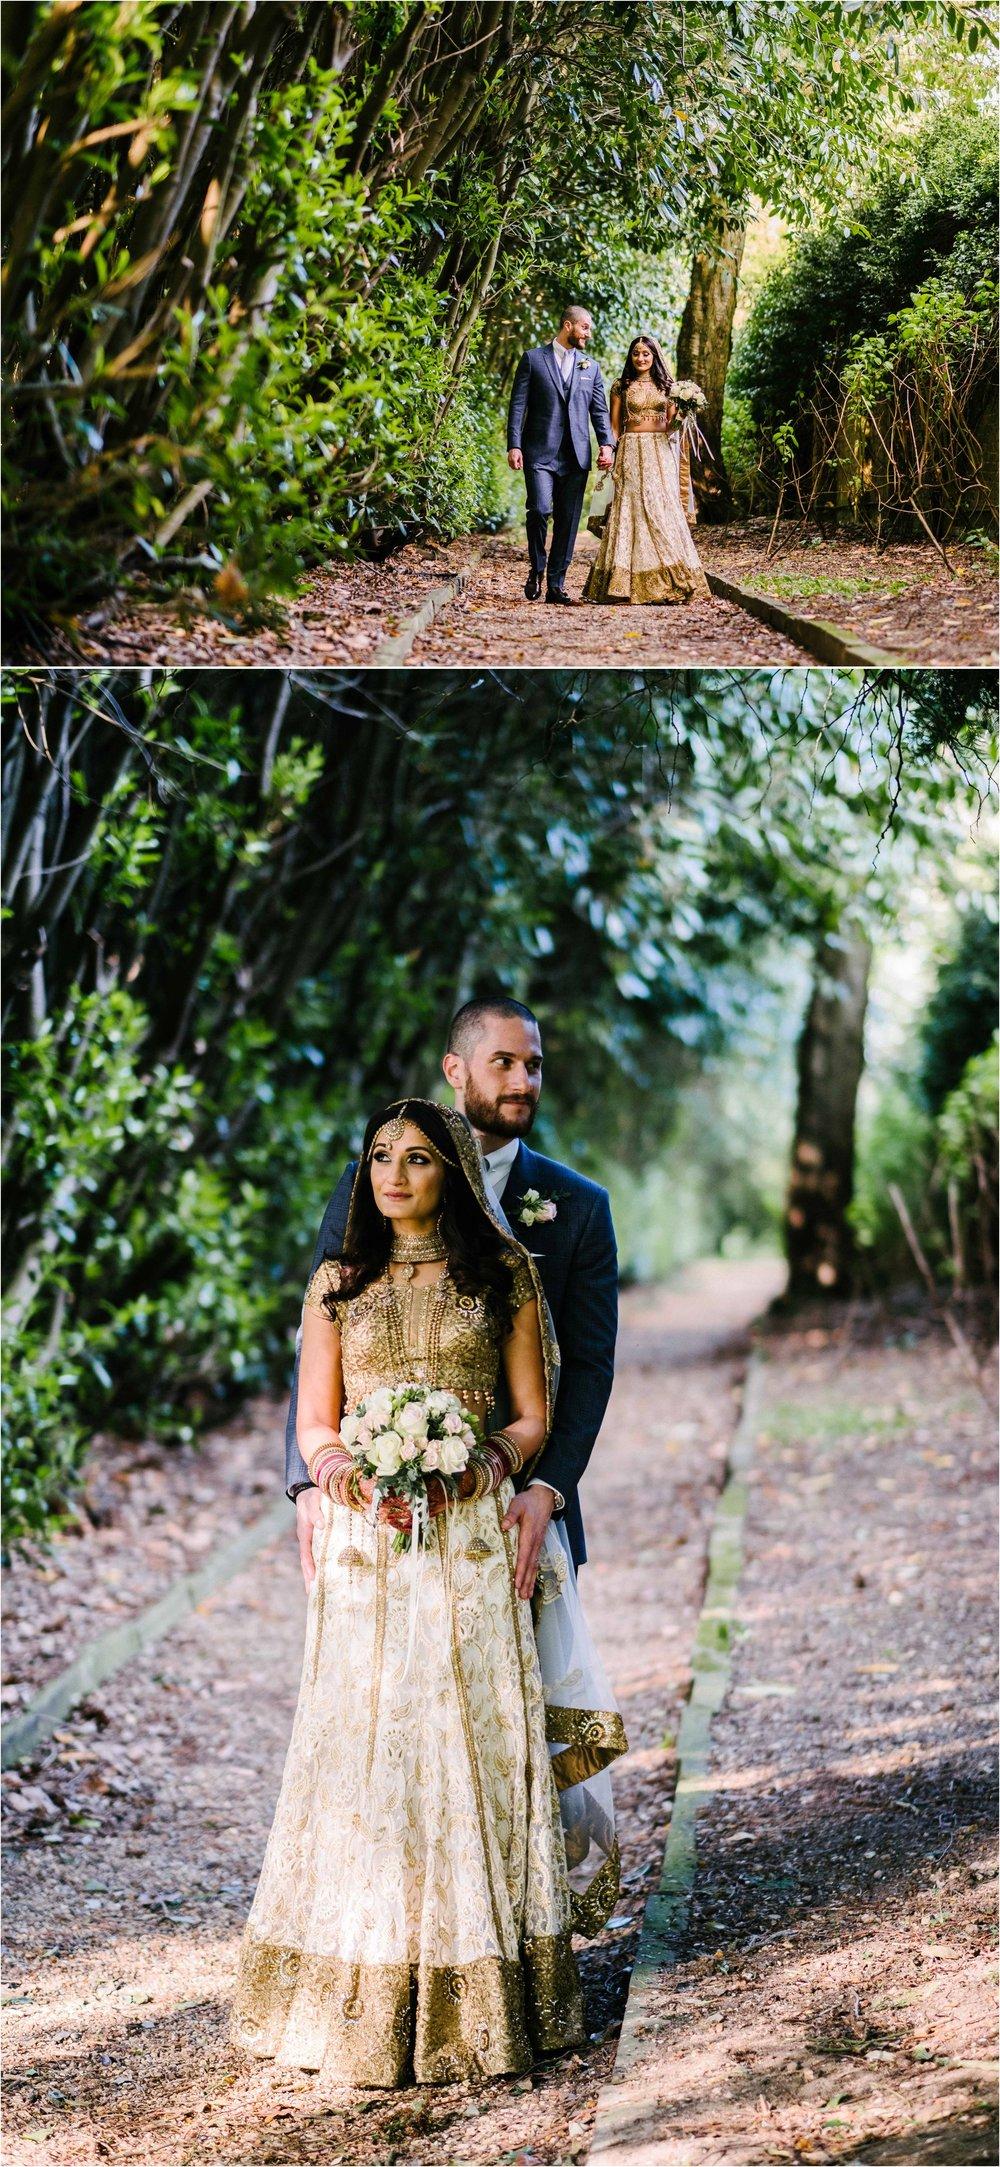 Sopwell House wedding photographer_0070.jpg